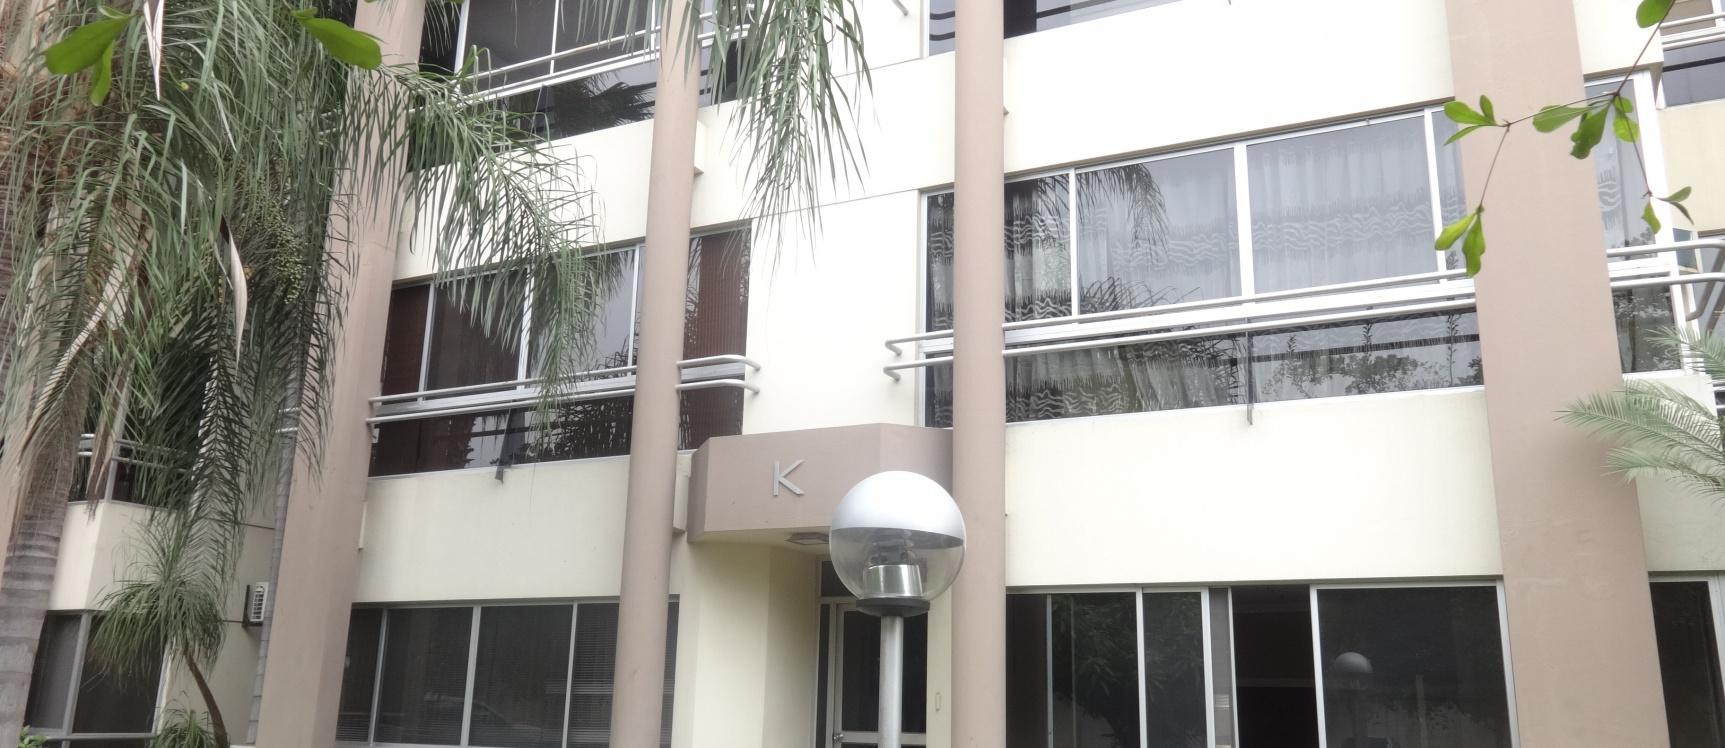 Geobienes Via Samborondon Km 25 San Andres Departamento En Venta Plusvalia Guayaquil